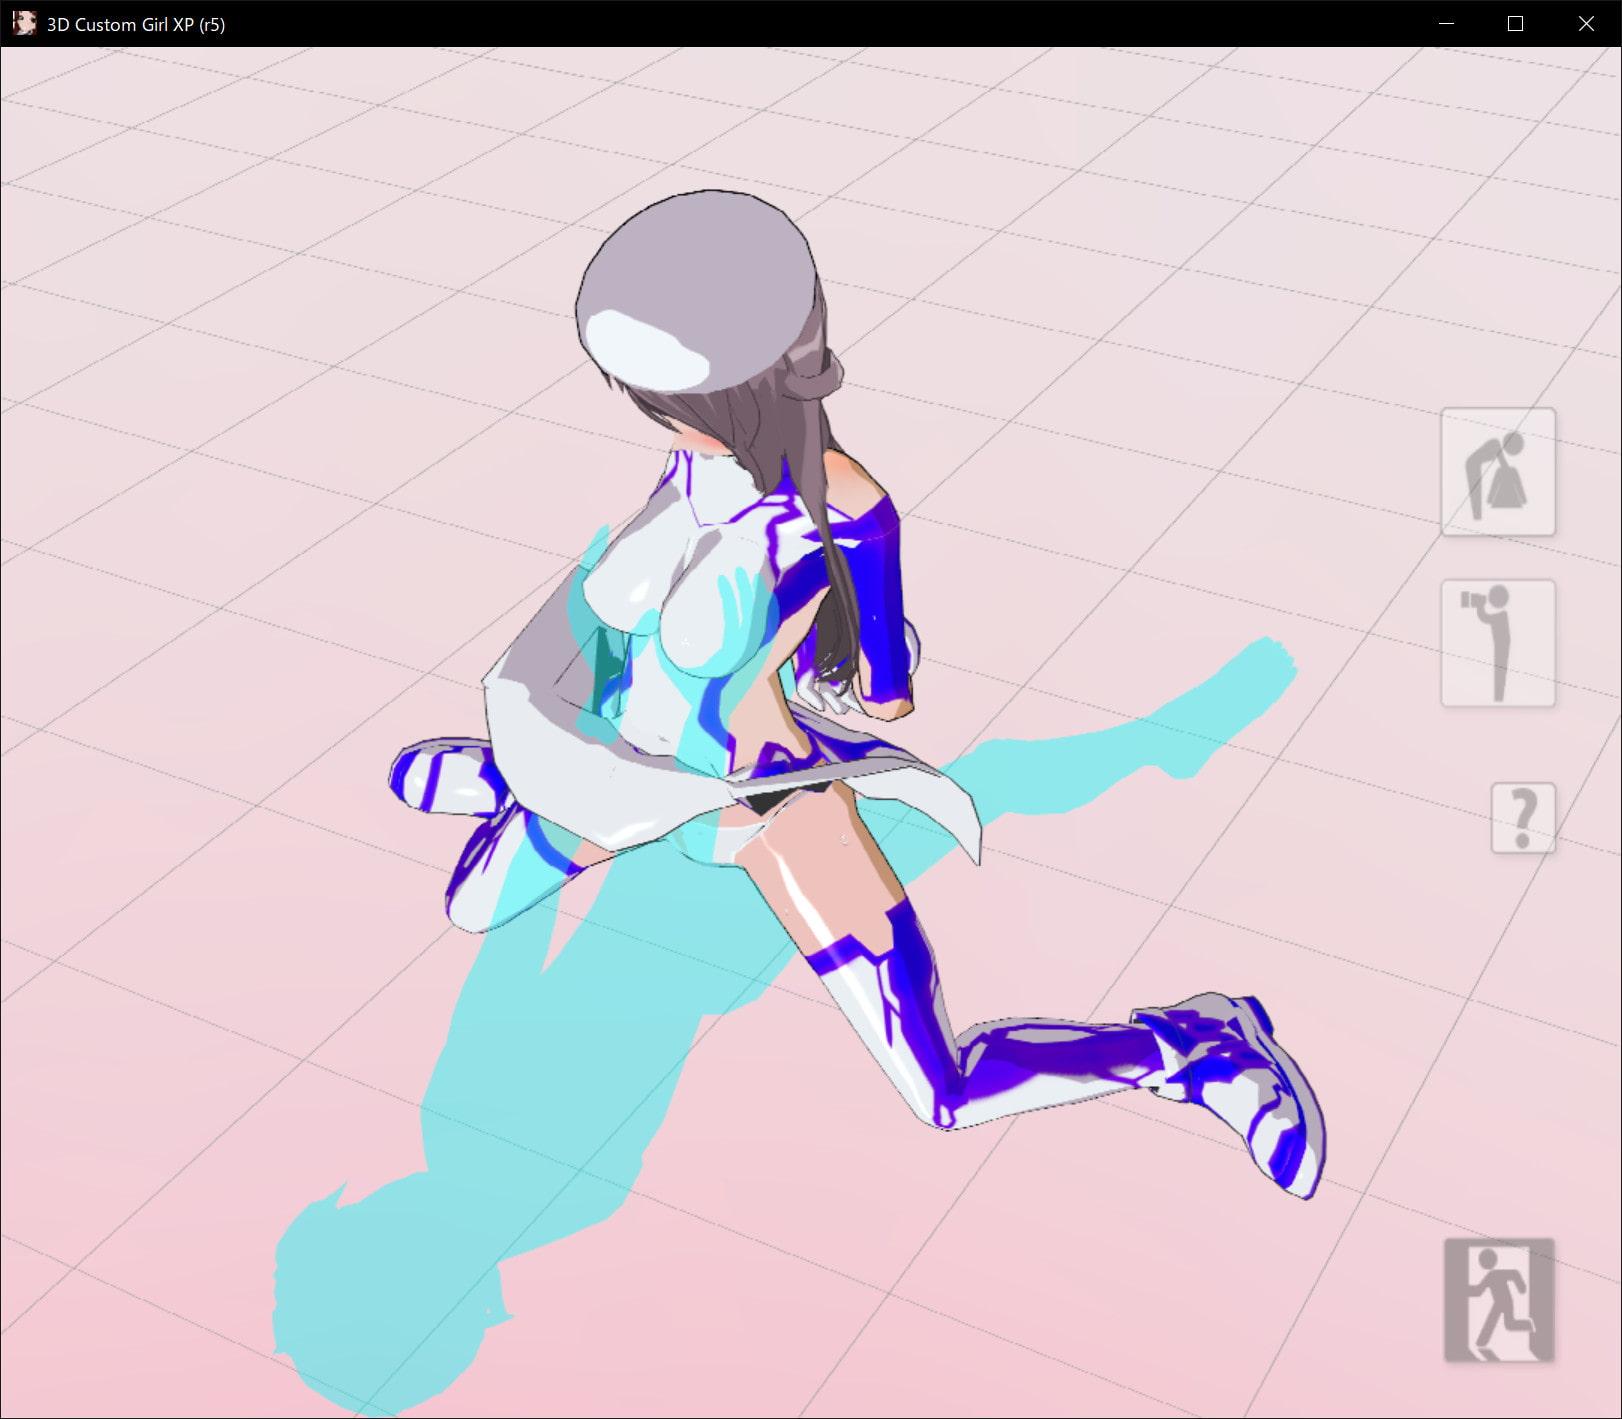 RJ319611 3Dカスタム少女改変モーション(騎乗位モーション) [20210304]